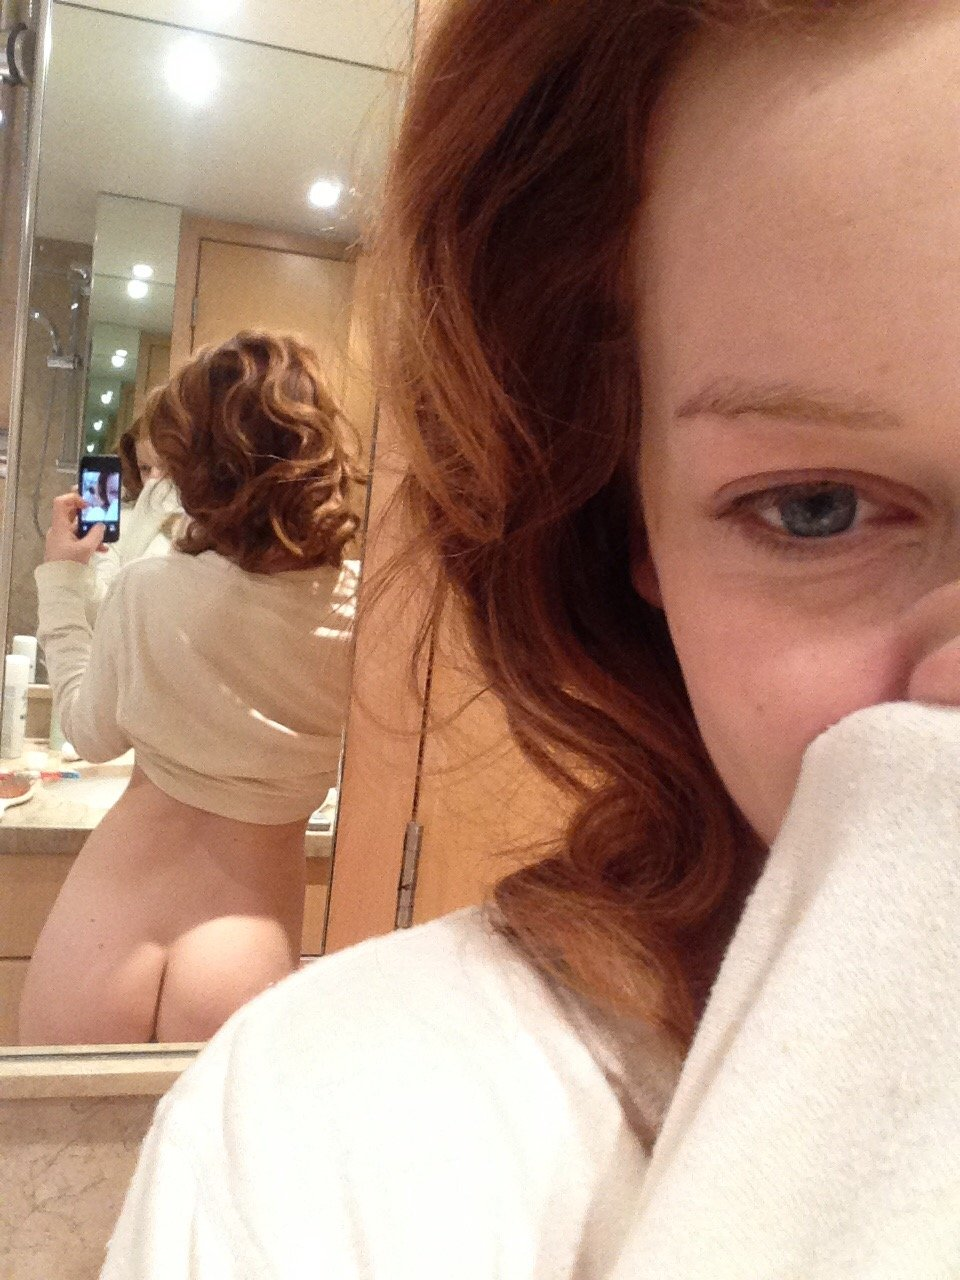 Naked jane levy Awesome Leaked